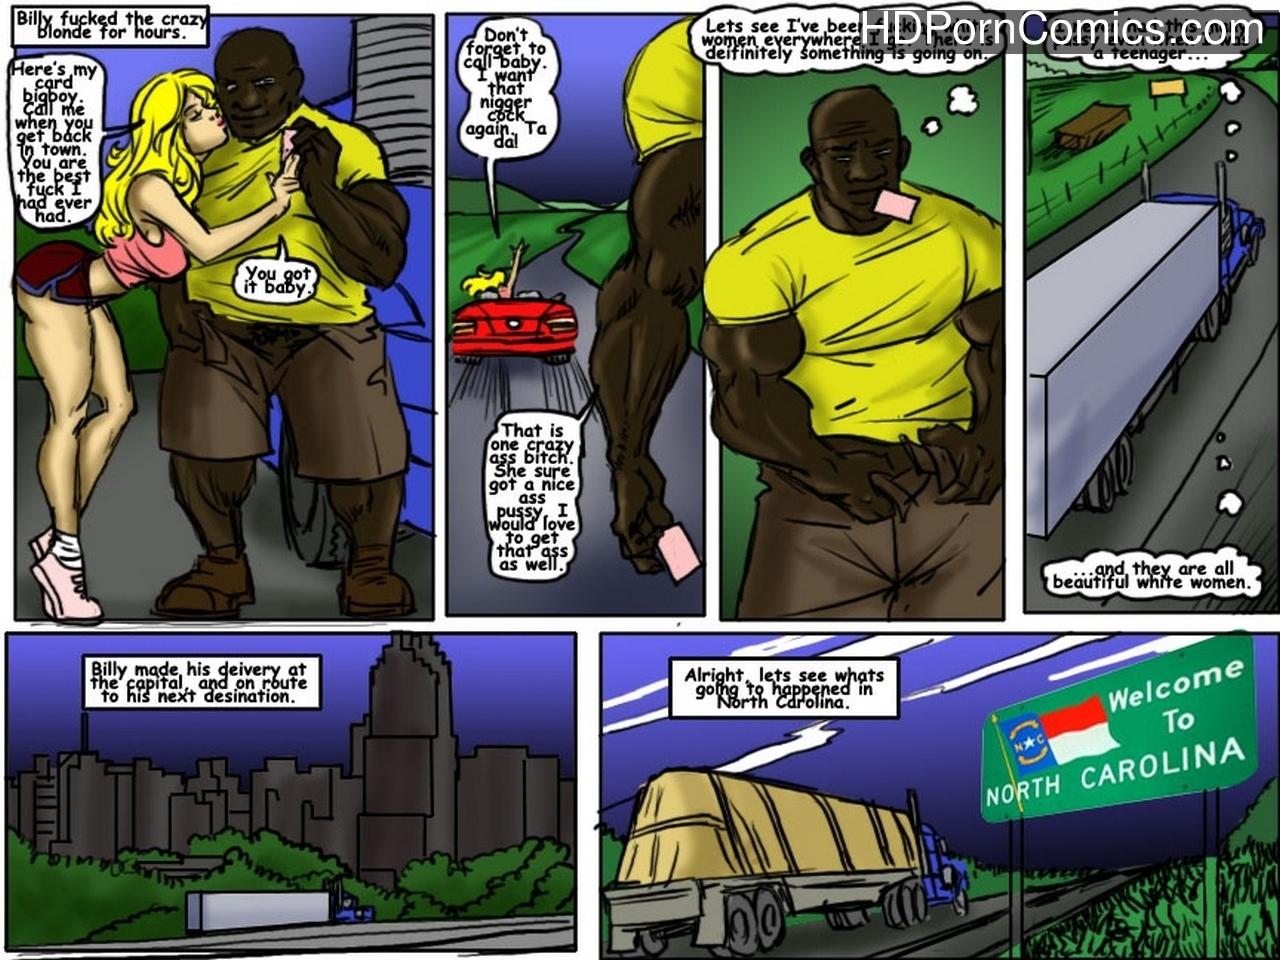 Adventures-Of-Big-Mack-3-South-Carolina 11 free sex comic